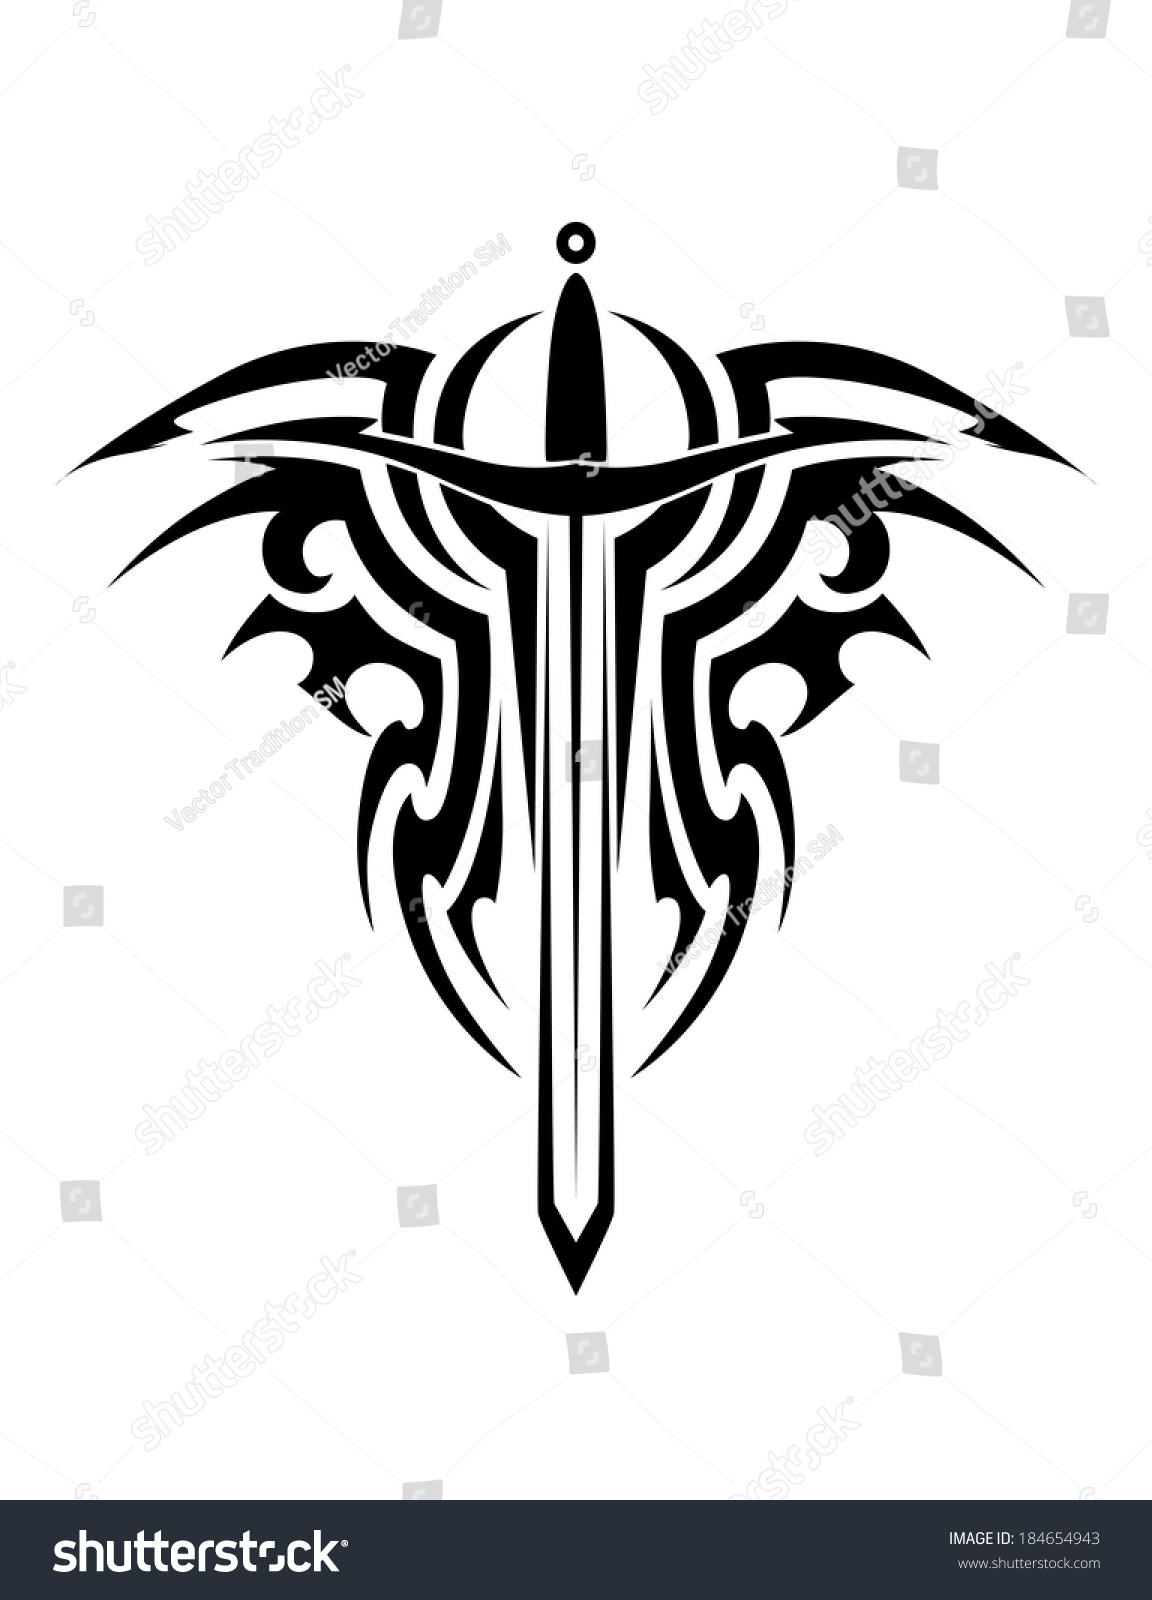 Tribal Tattoo Logo Design Medieval Sword Stock Vector (Royalty Free ...